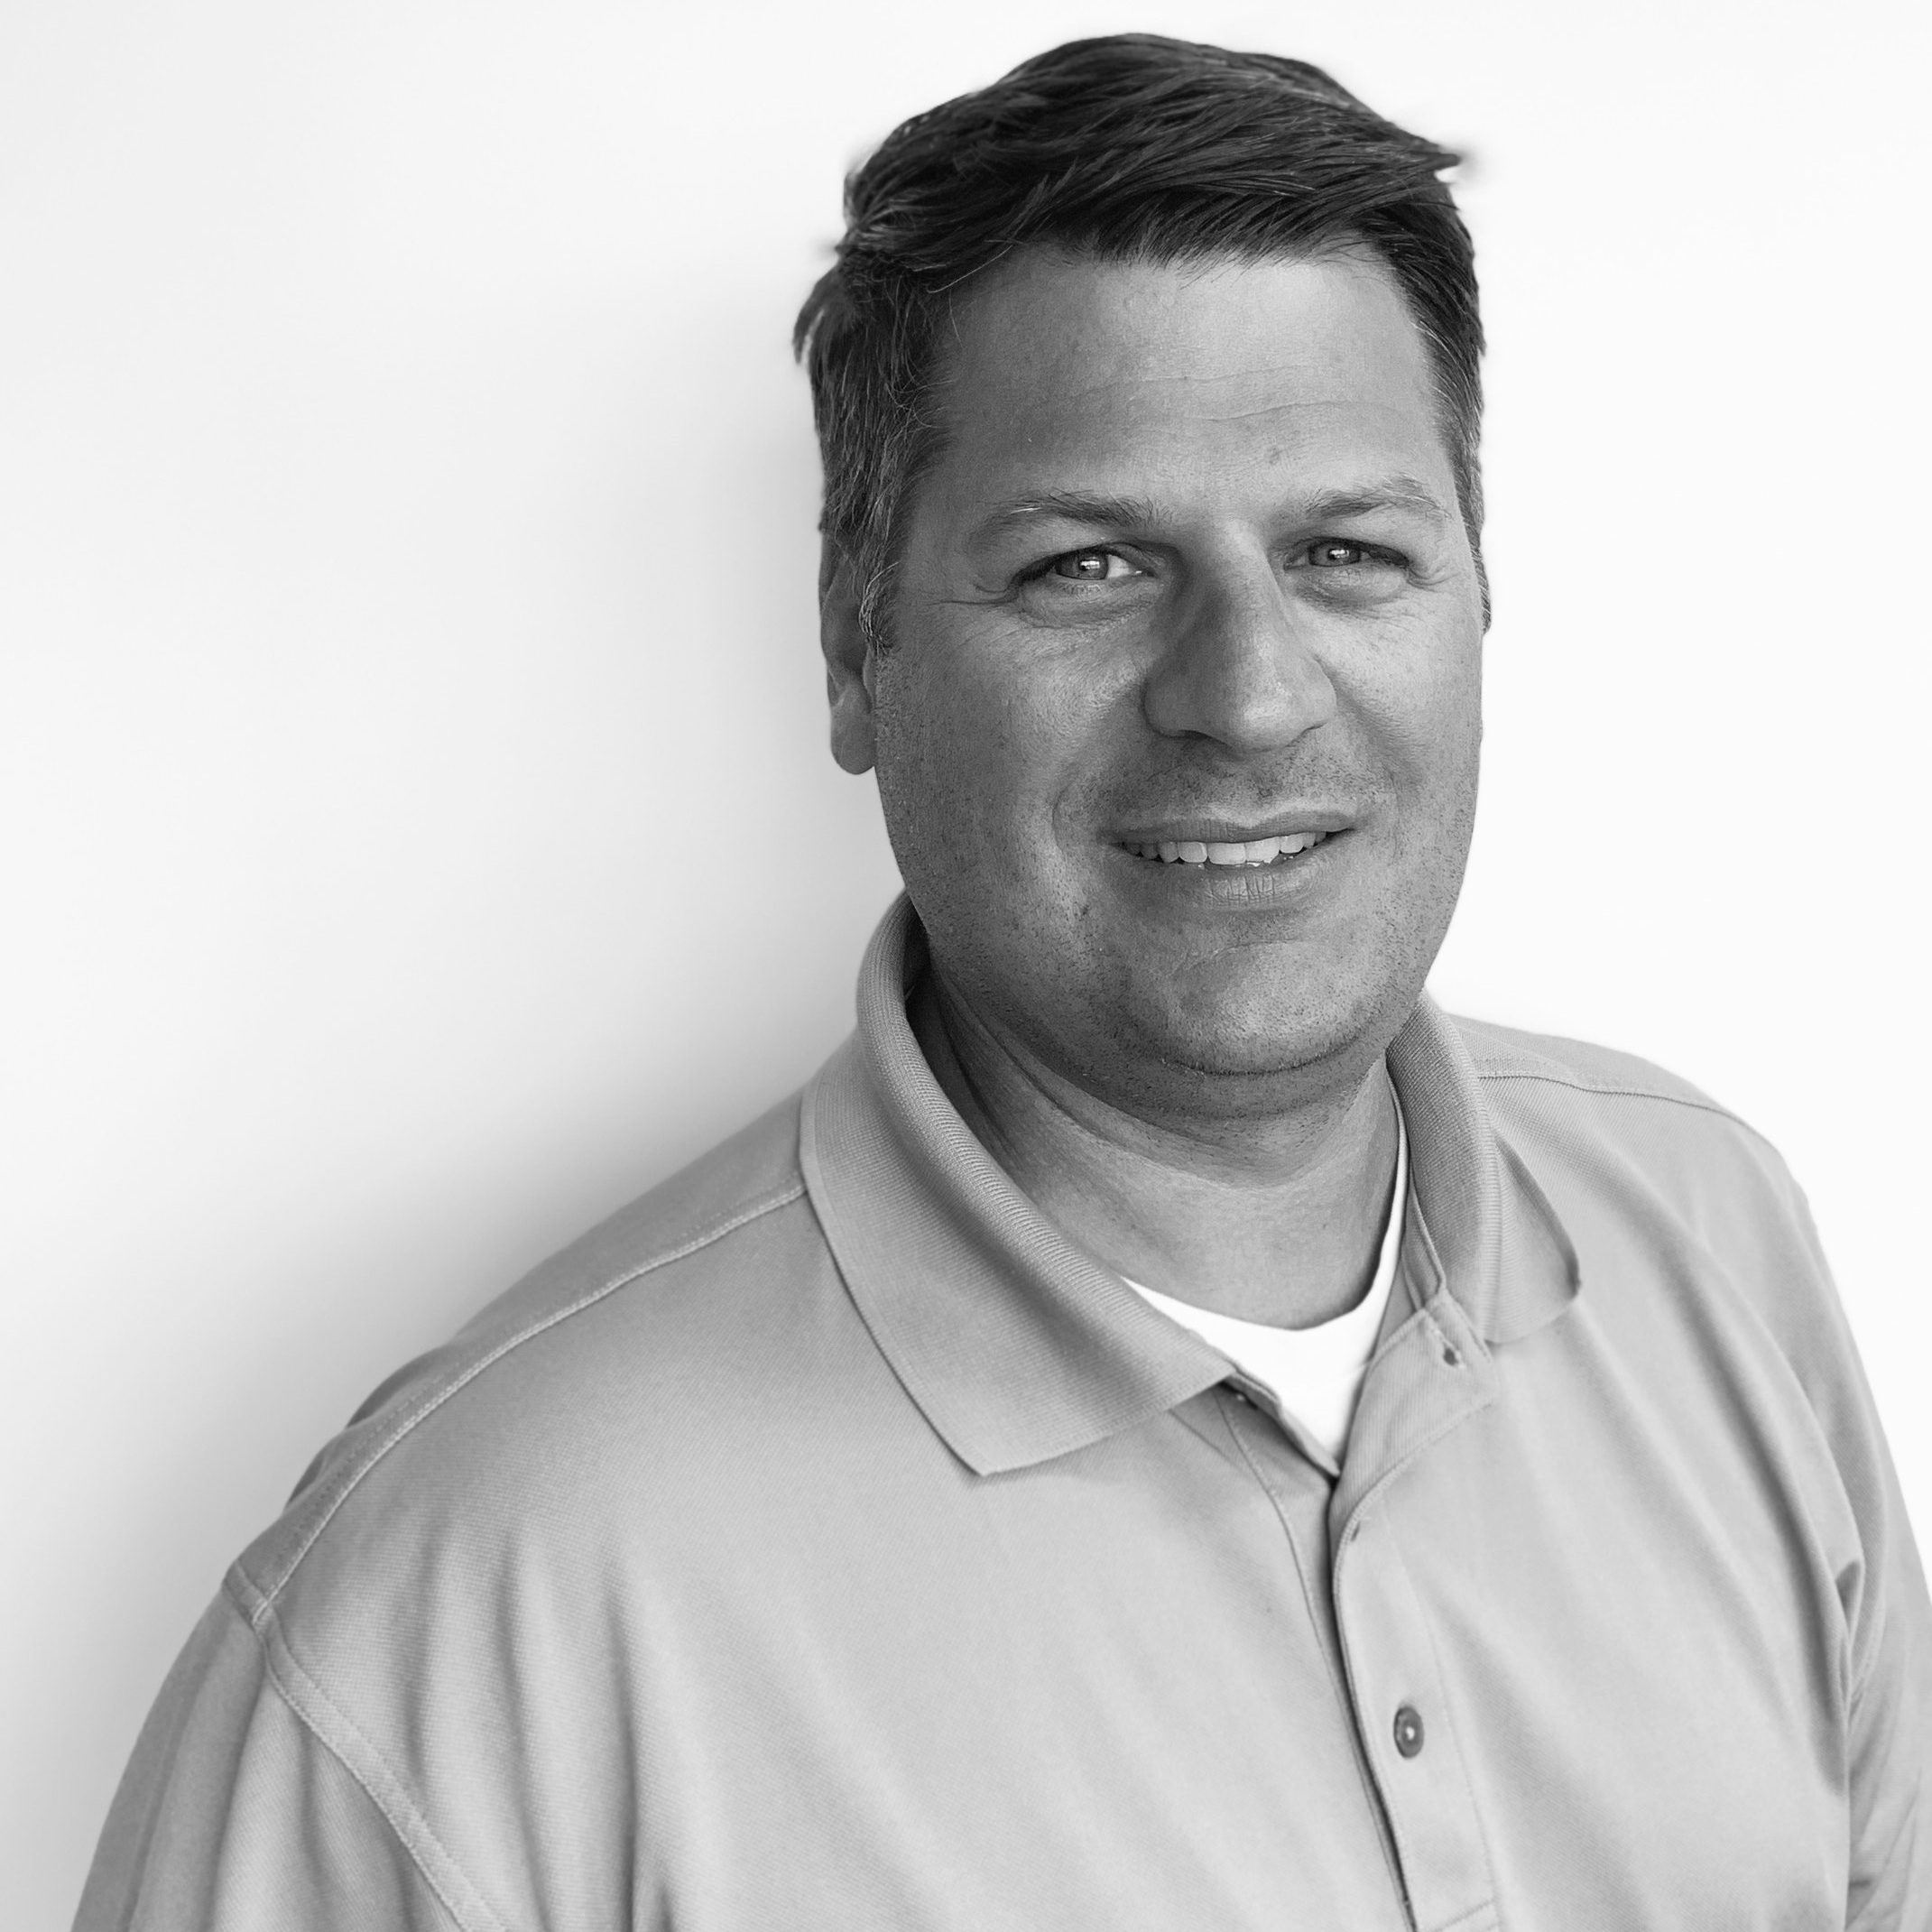 Ross R. Grippi, II - VP of Enrollment Strategy & Partnerships